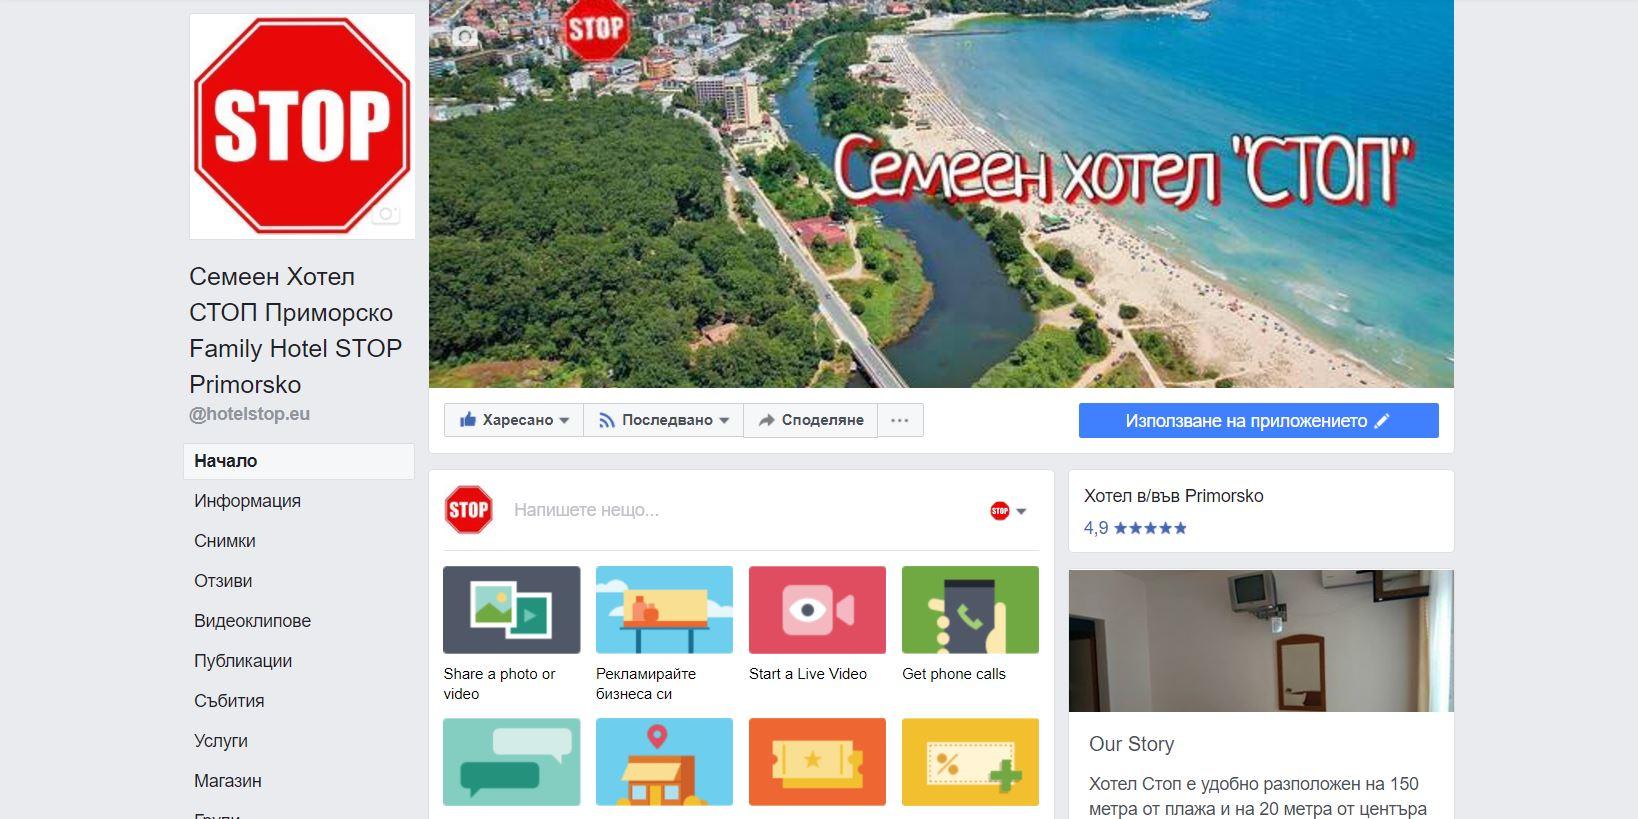 Семеен Хотел СТОП Приморско - Family Hotel STOP Primorsko